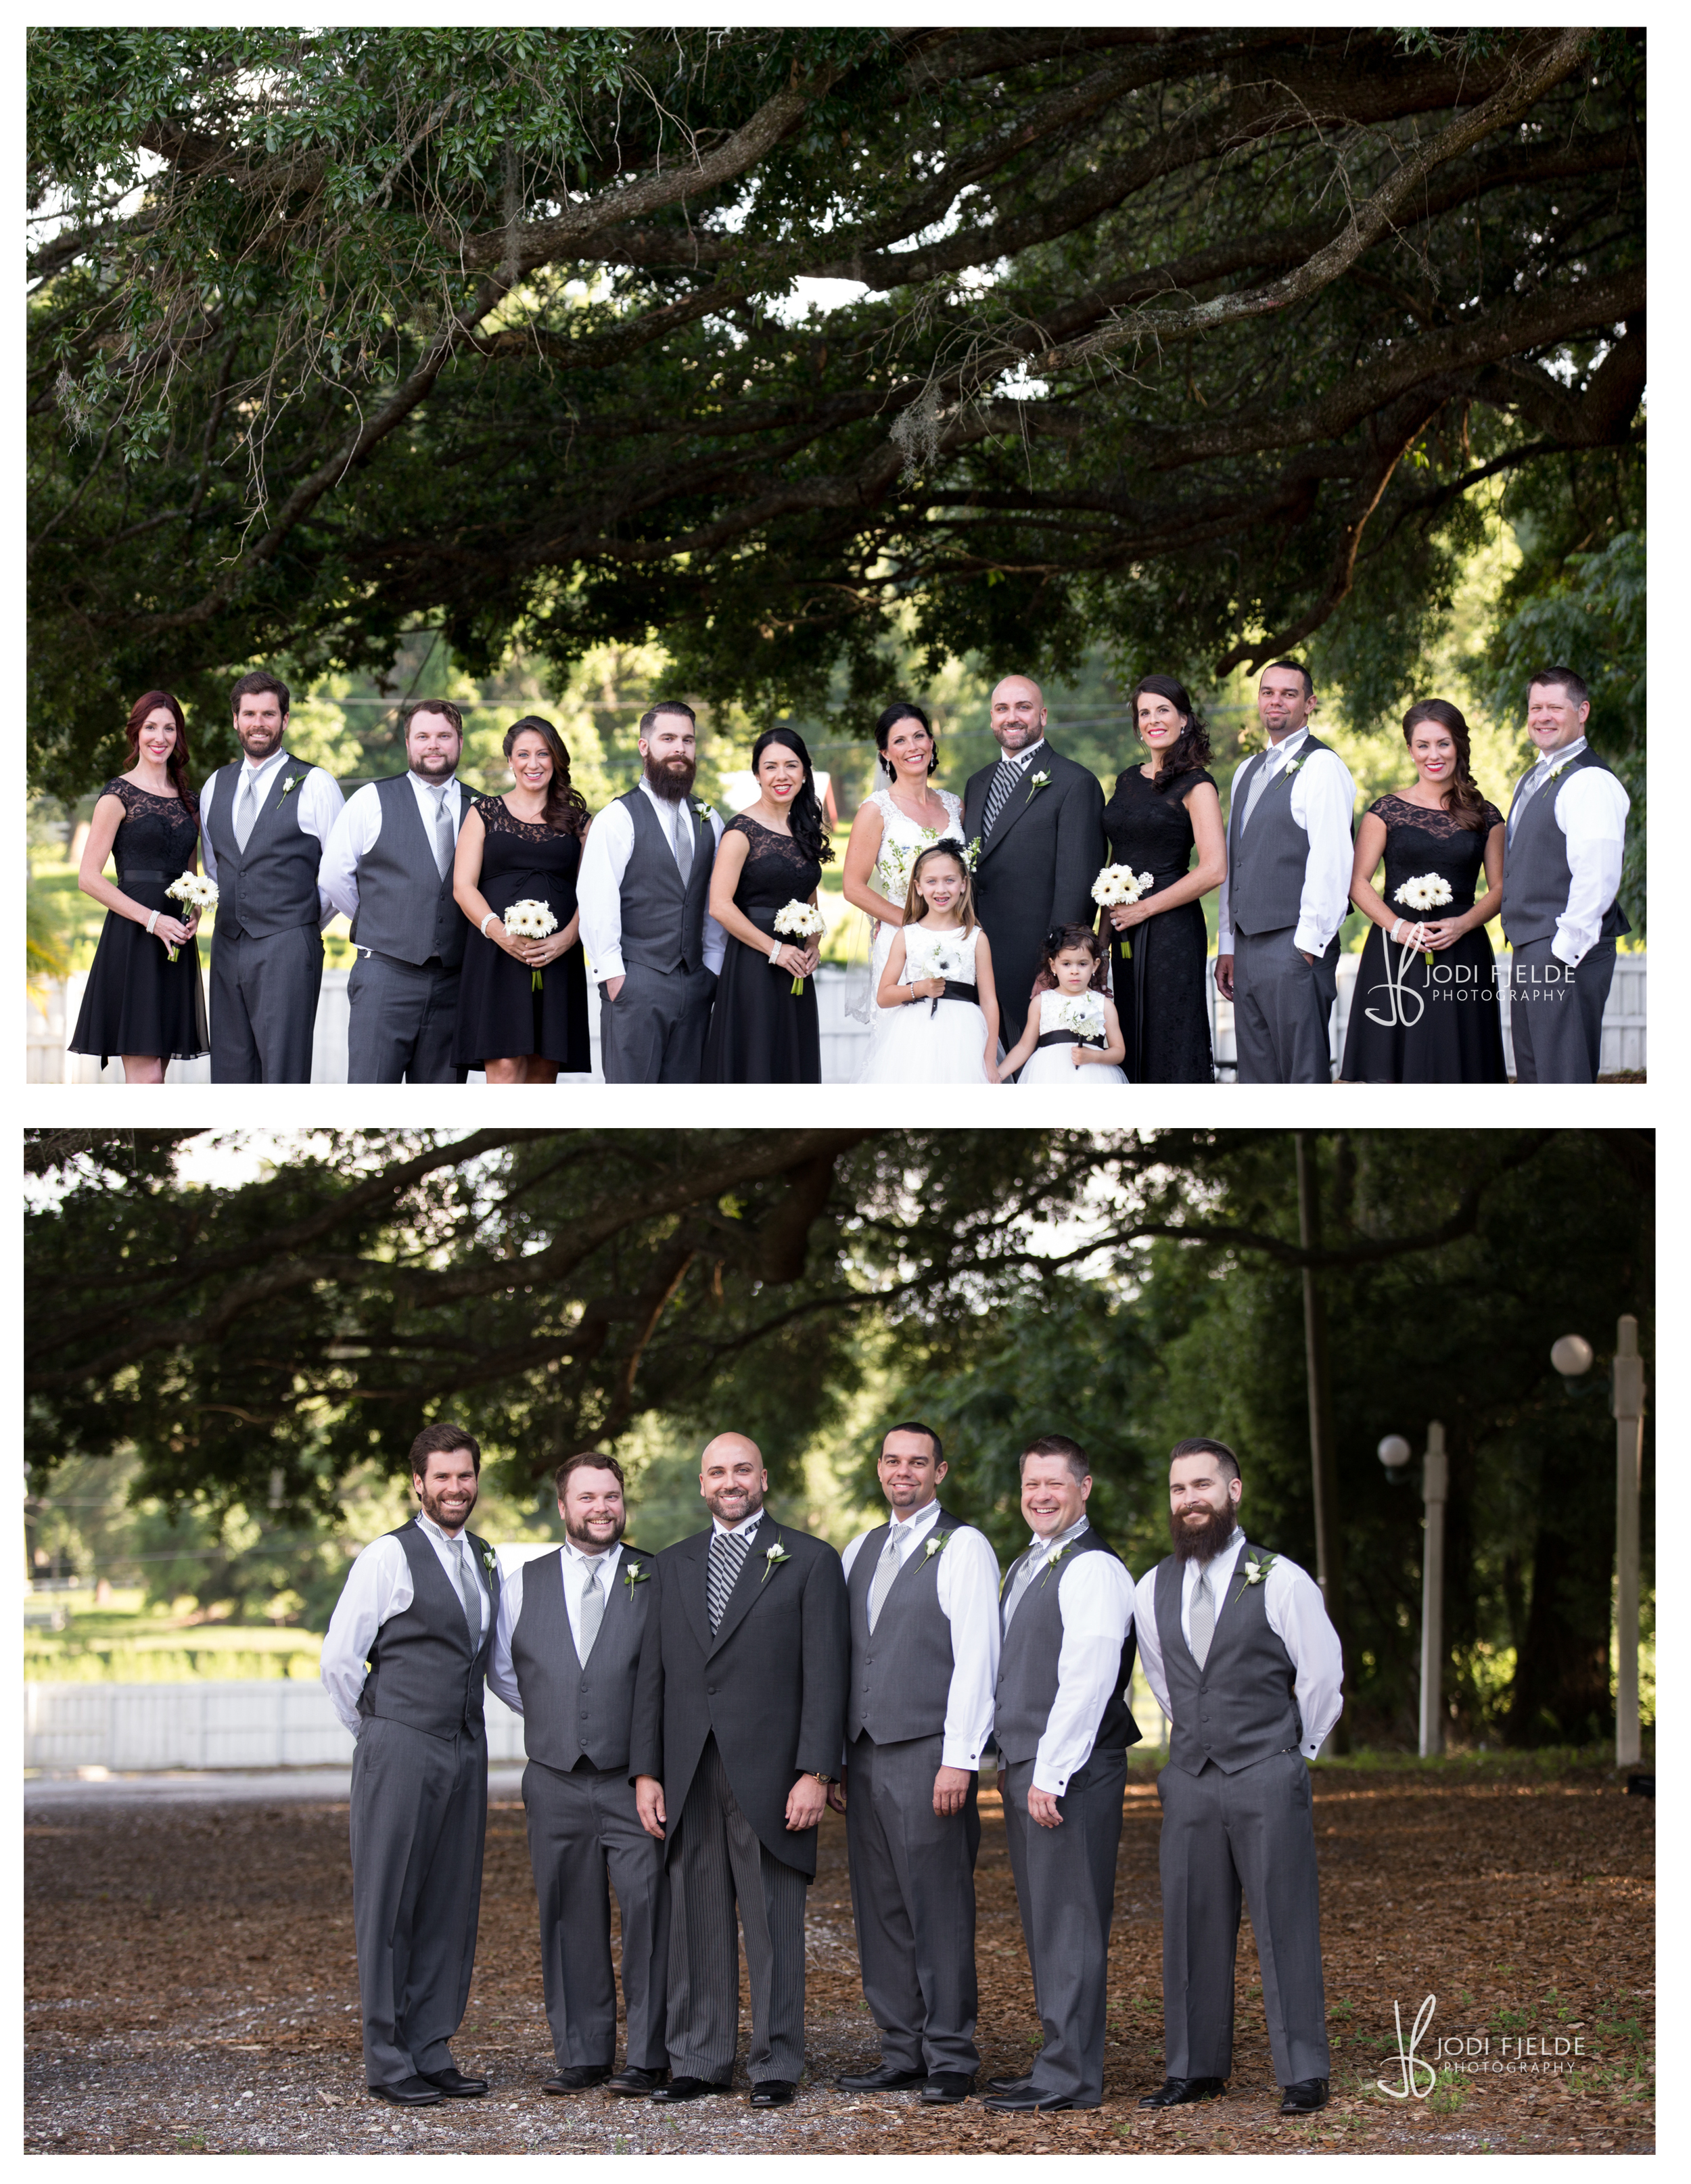 Highland_Manor_Apopka_Florida_wedding_Jackie_&_Tim_photography_jodi_Fjelde_photography-22.jpg